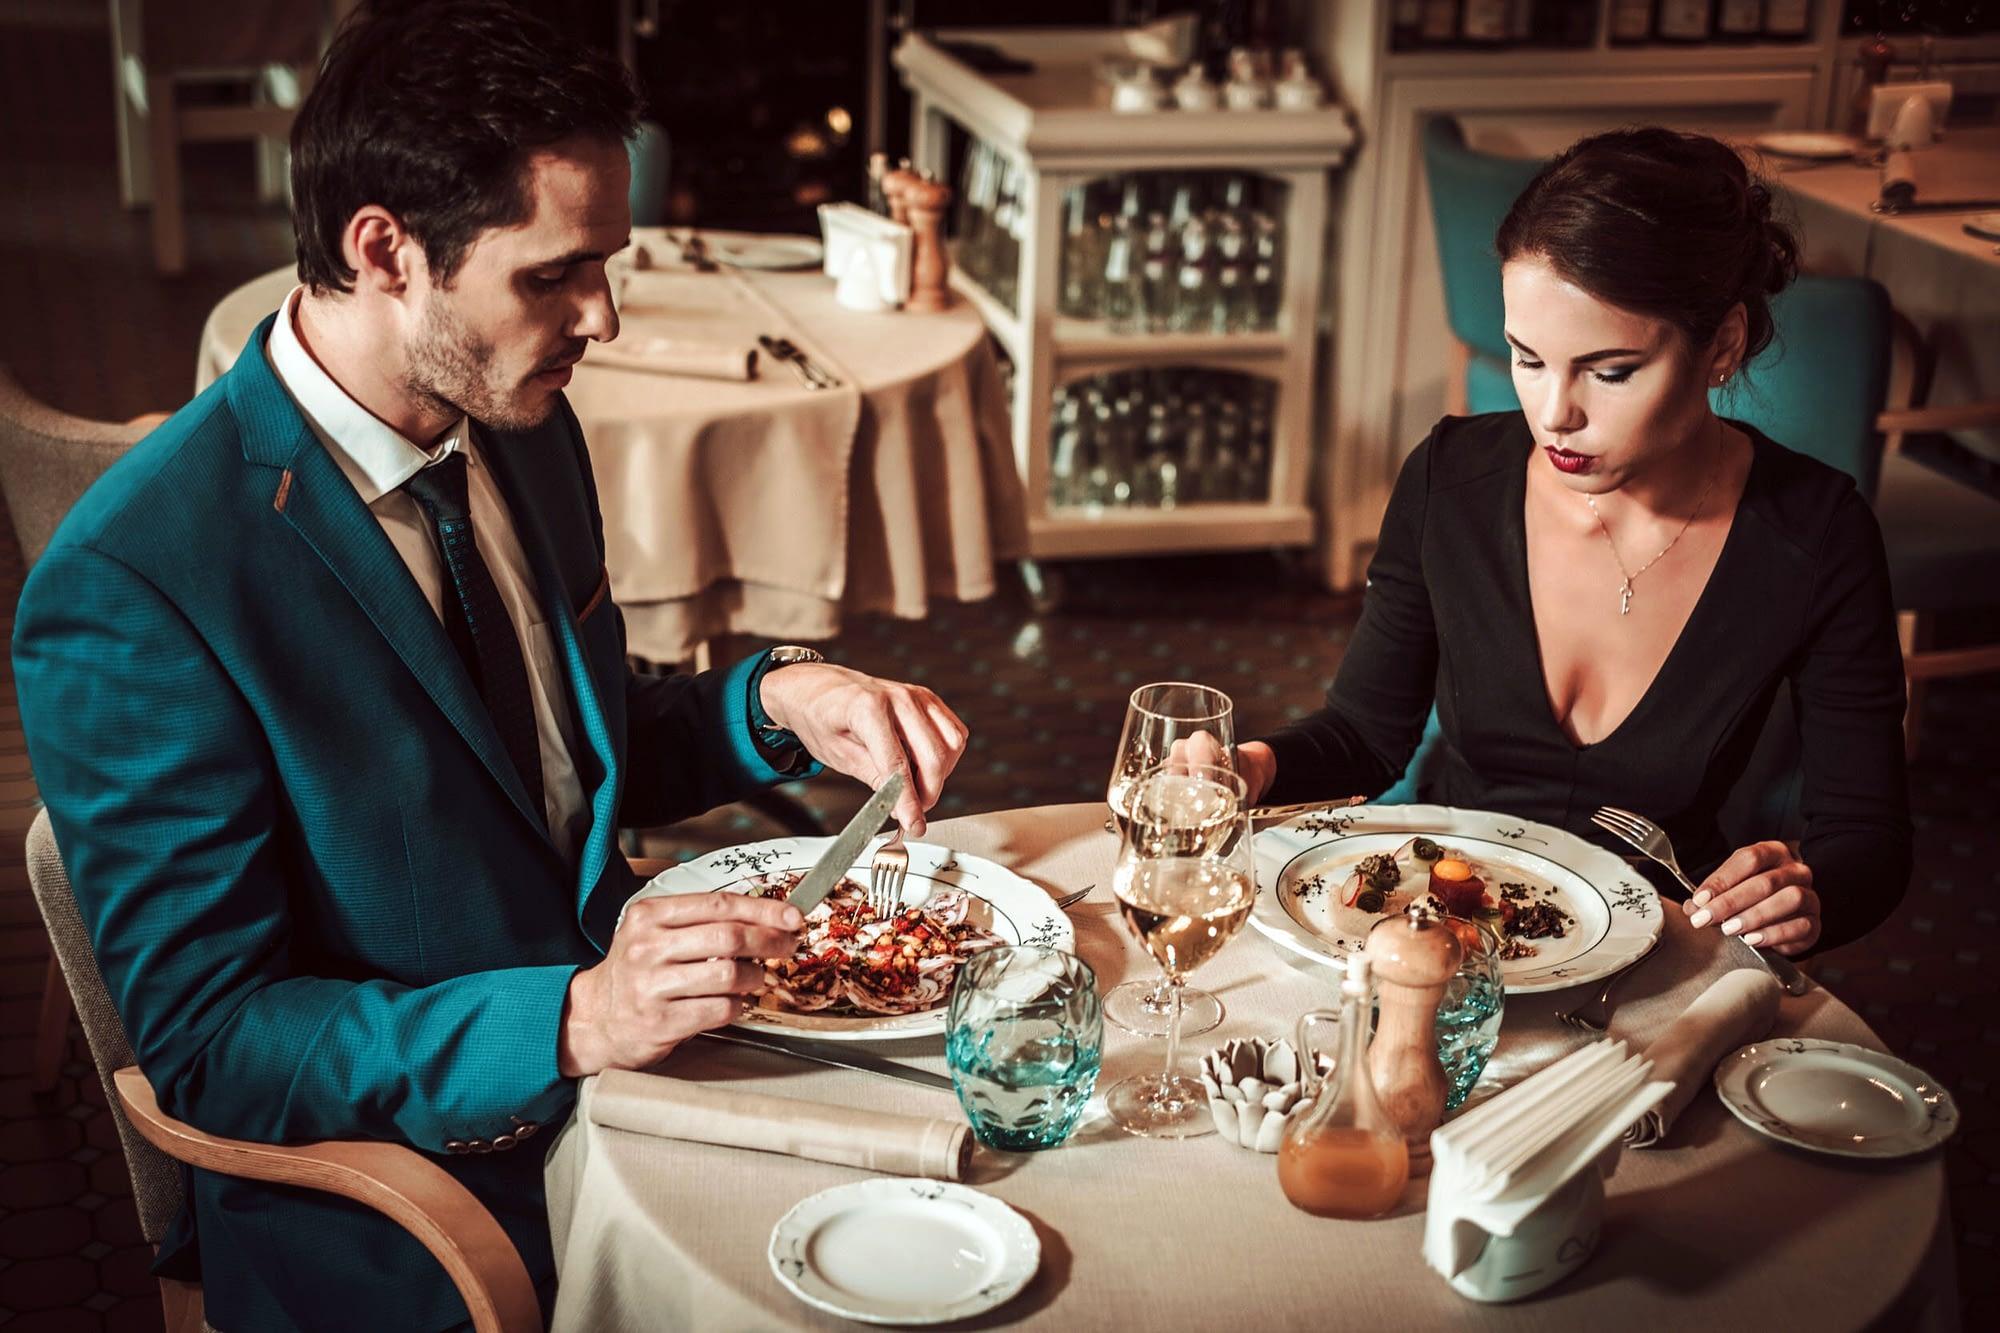 A first date should not be an interrogation